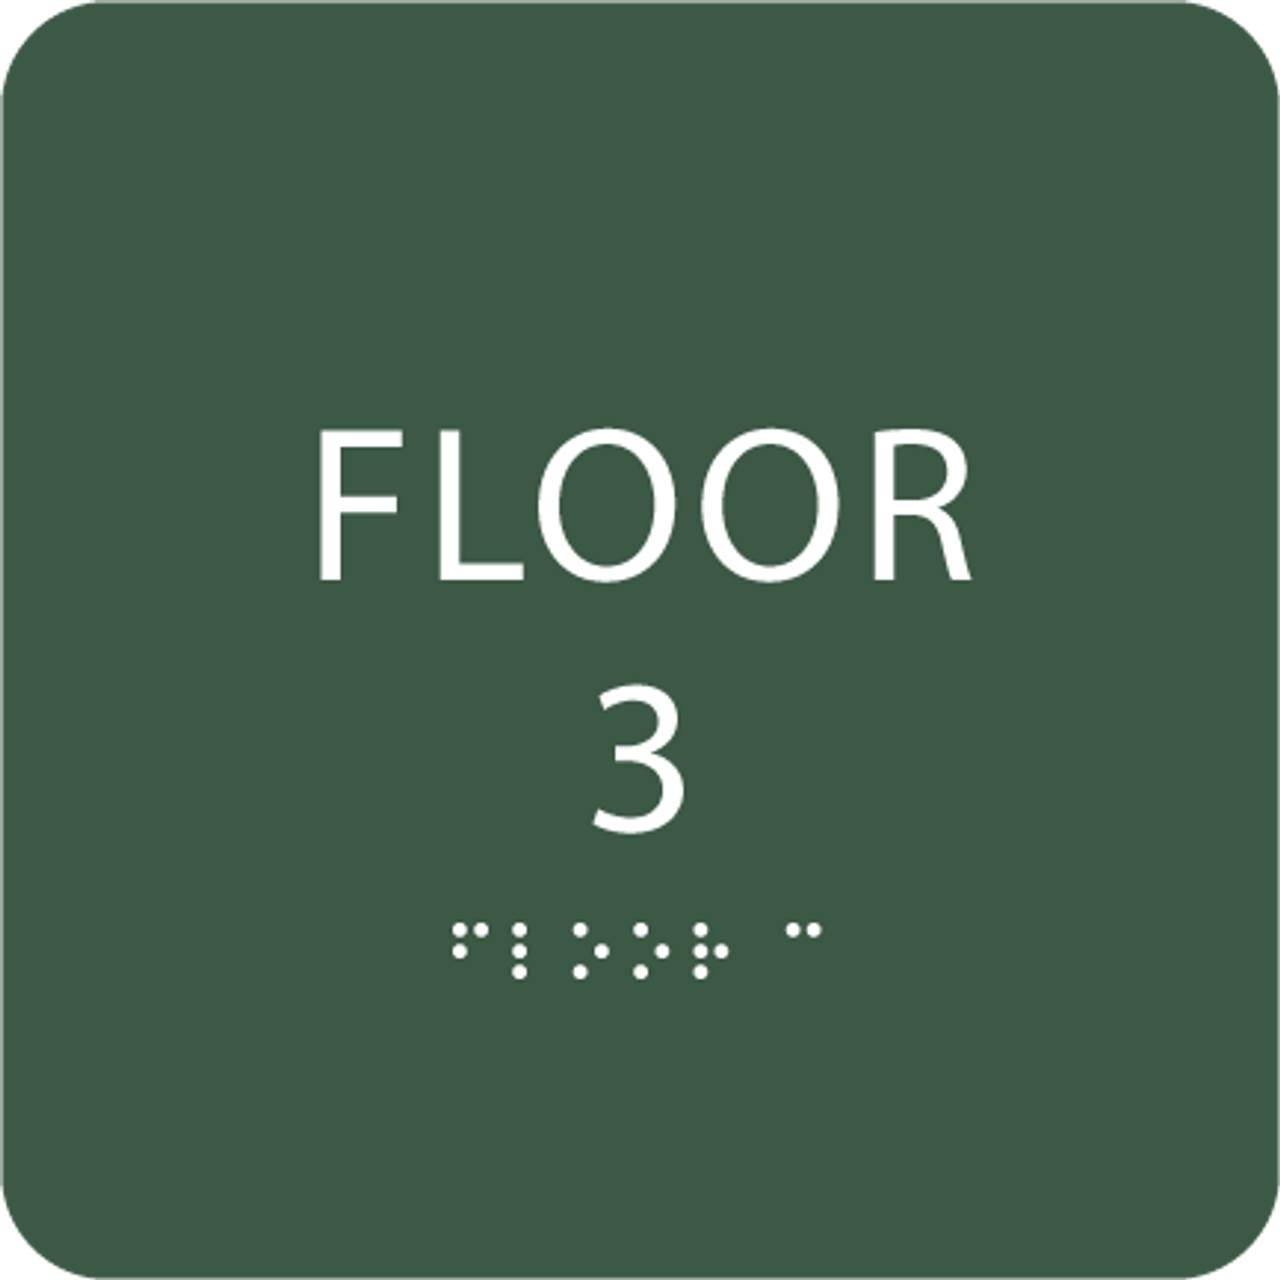 Green Floor 3 Level Sign